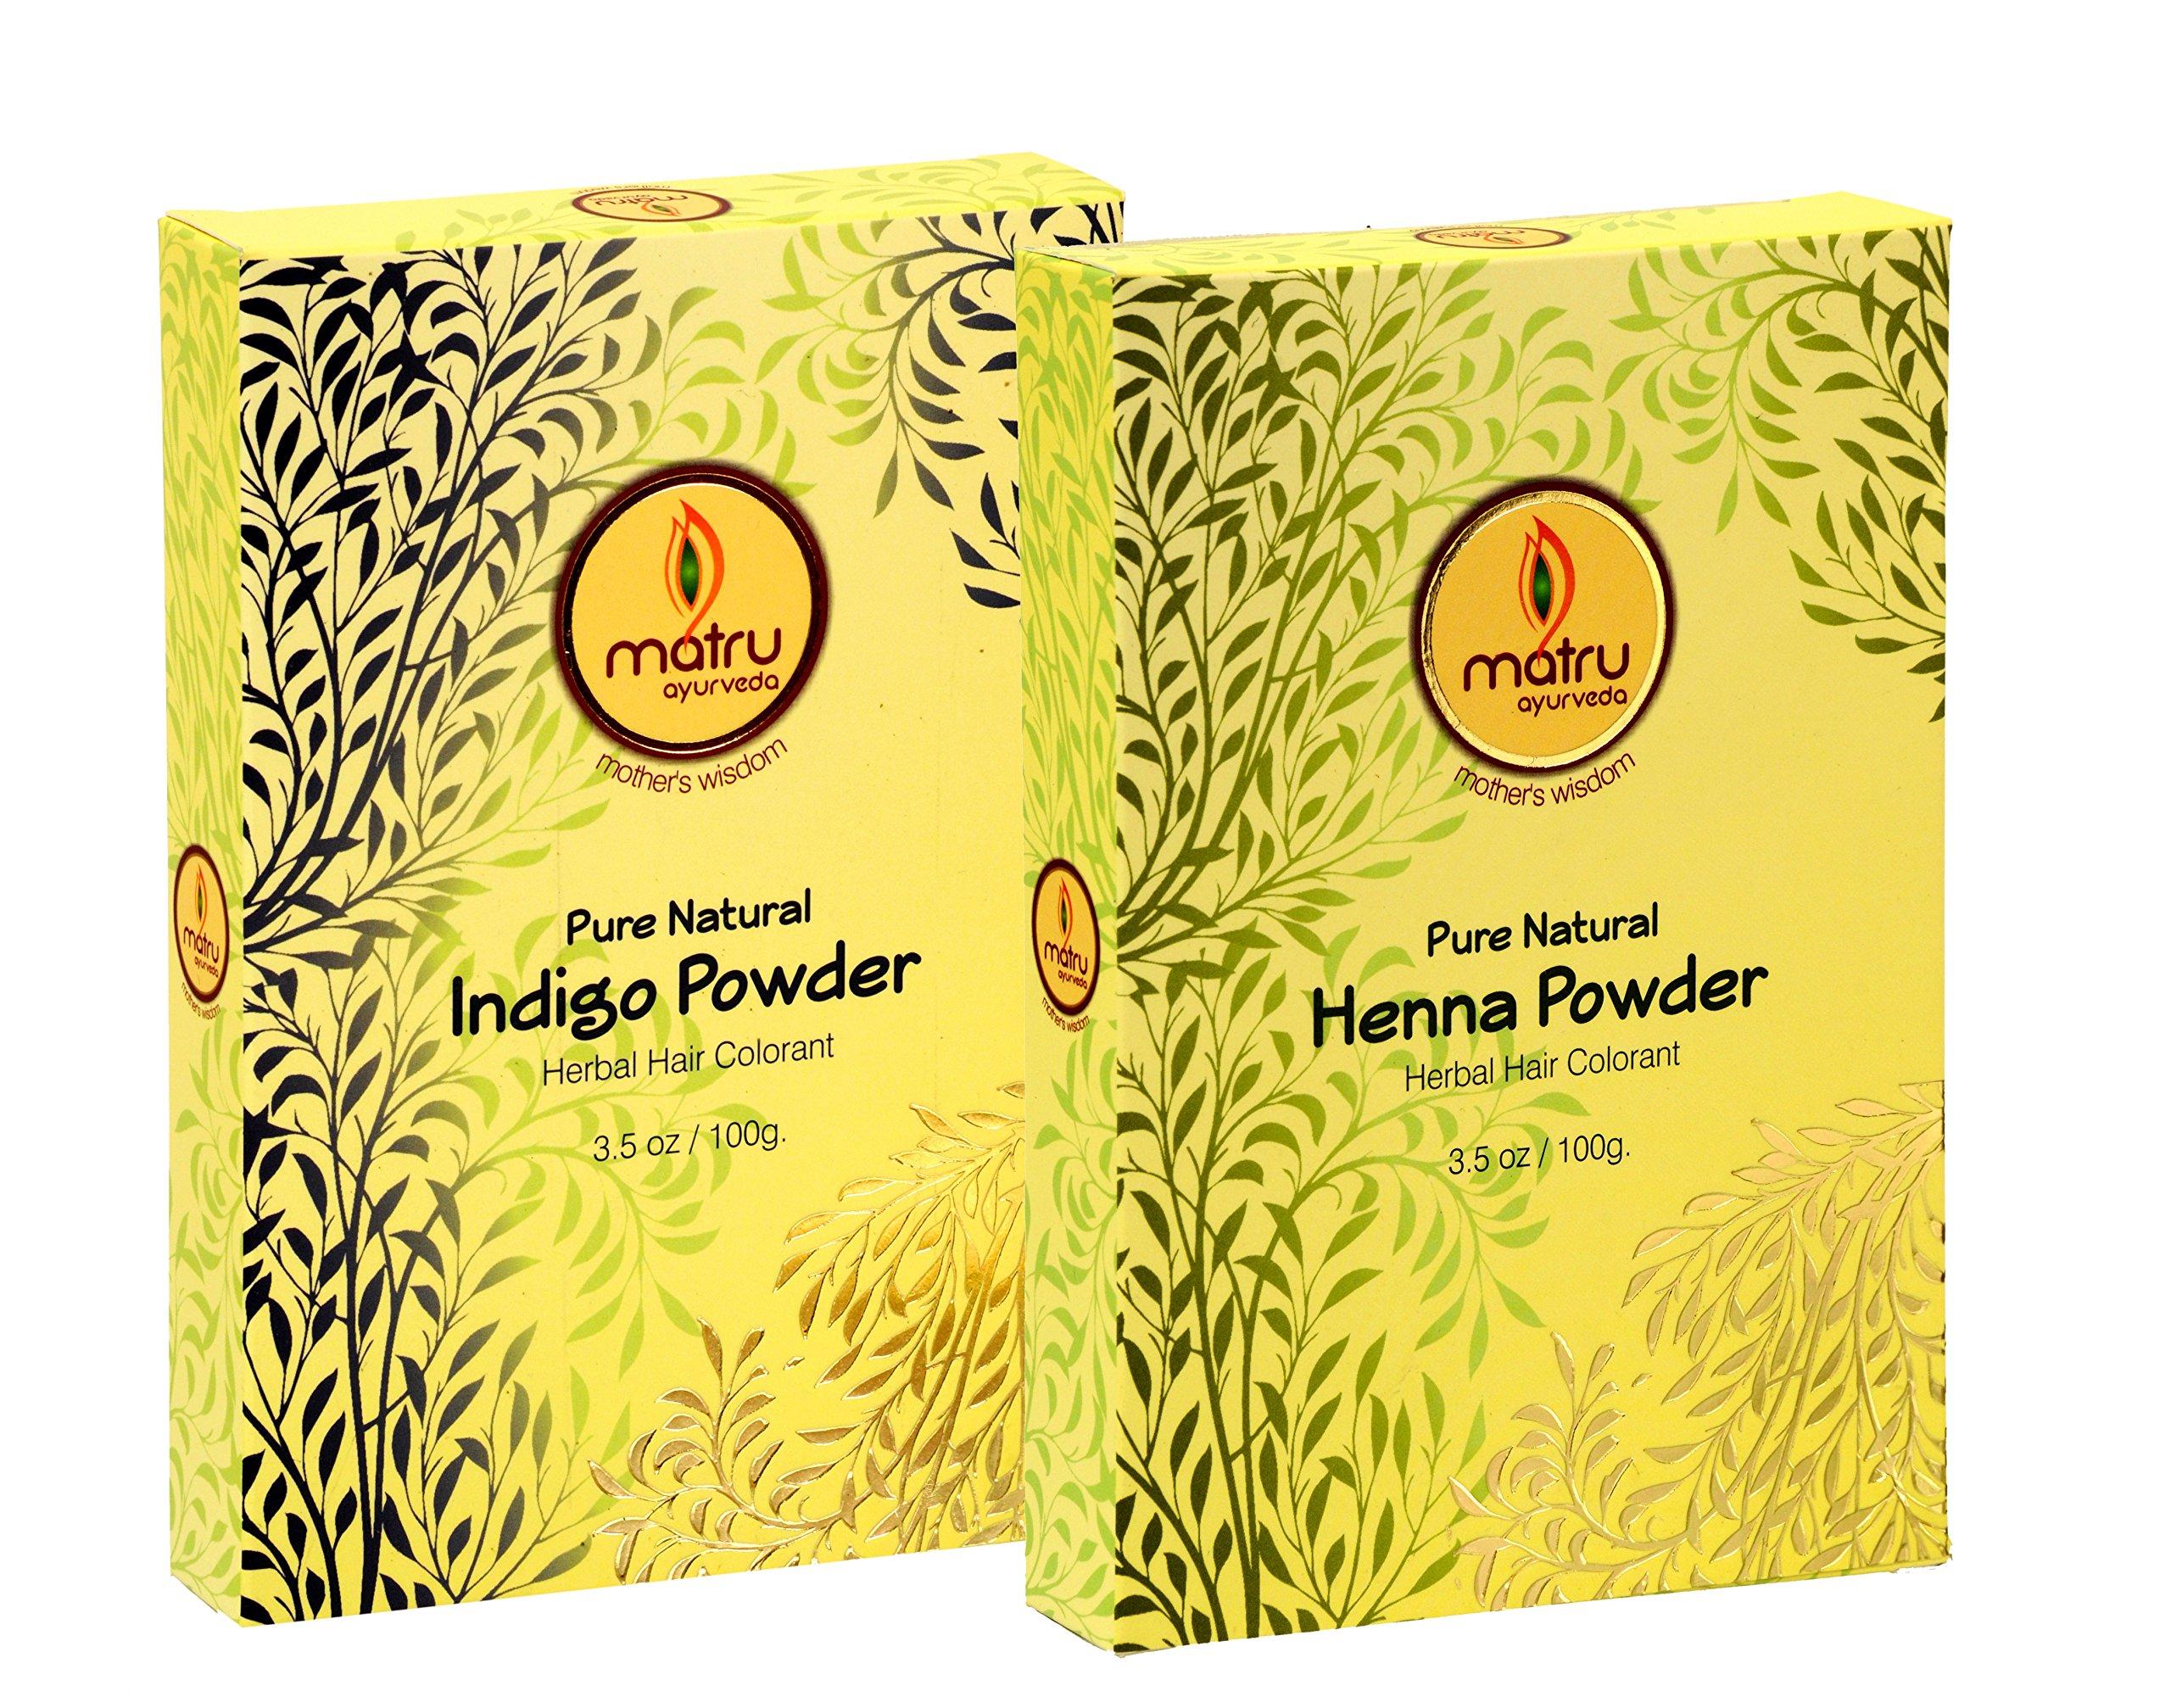 MATRU AYURVEDA Mehndi/Henna(100gms)+Indigo(100gms) Powder Ayurvedic/Herbal Hair and Beard Dye/Color Kit. 100% Pure and Natural; Chemical Free Hair and Beard Color/Dye; Covers Gray Hair, (single)